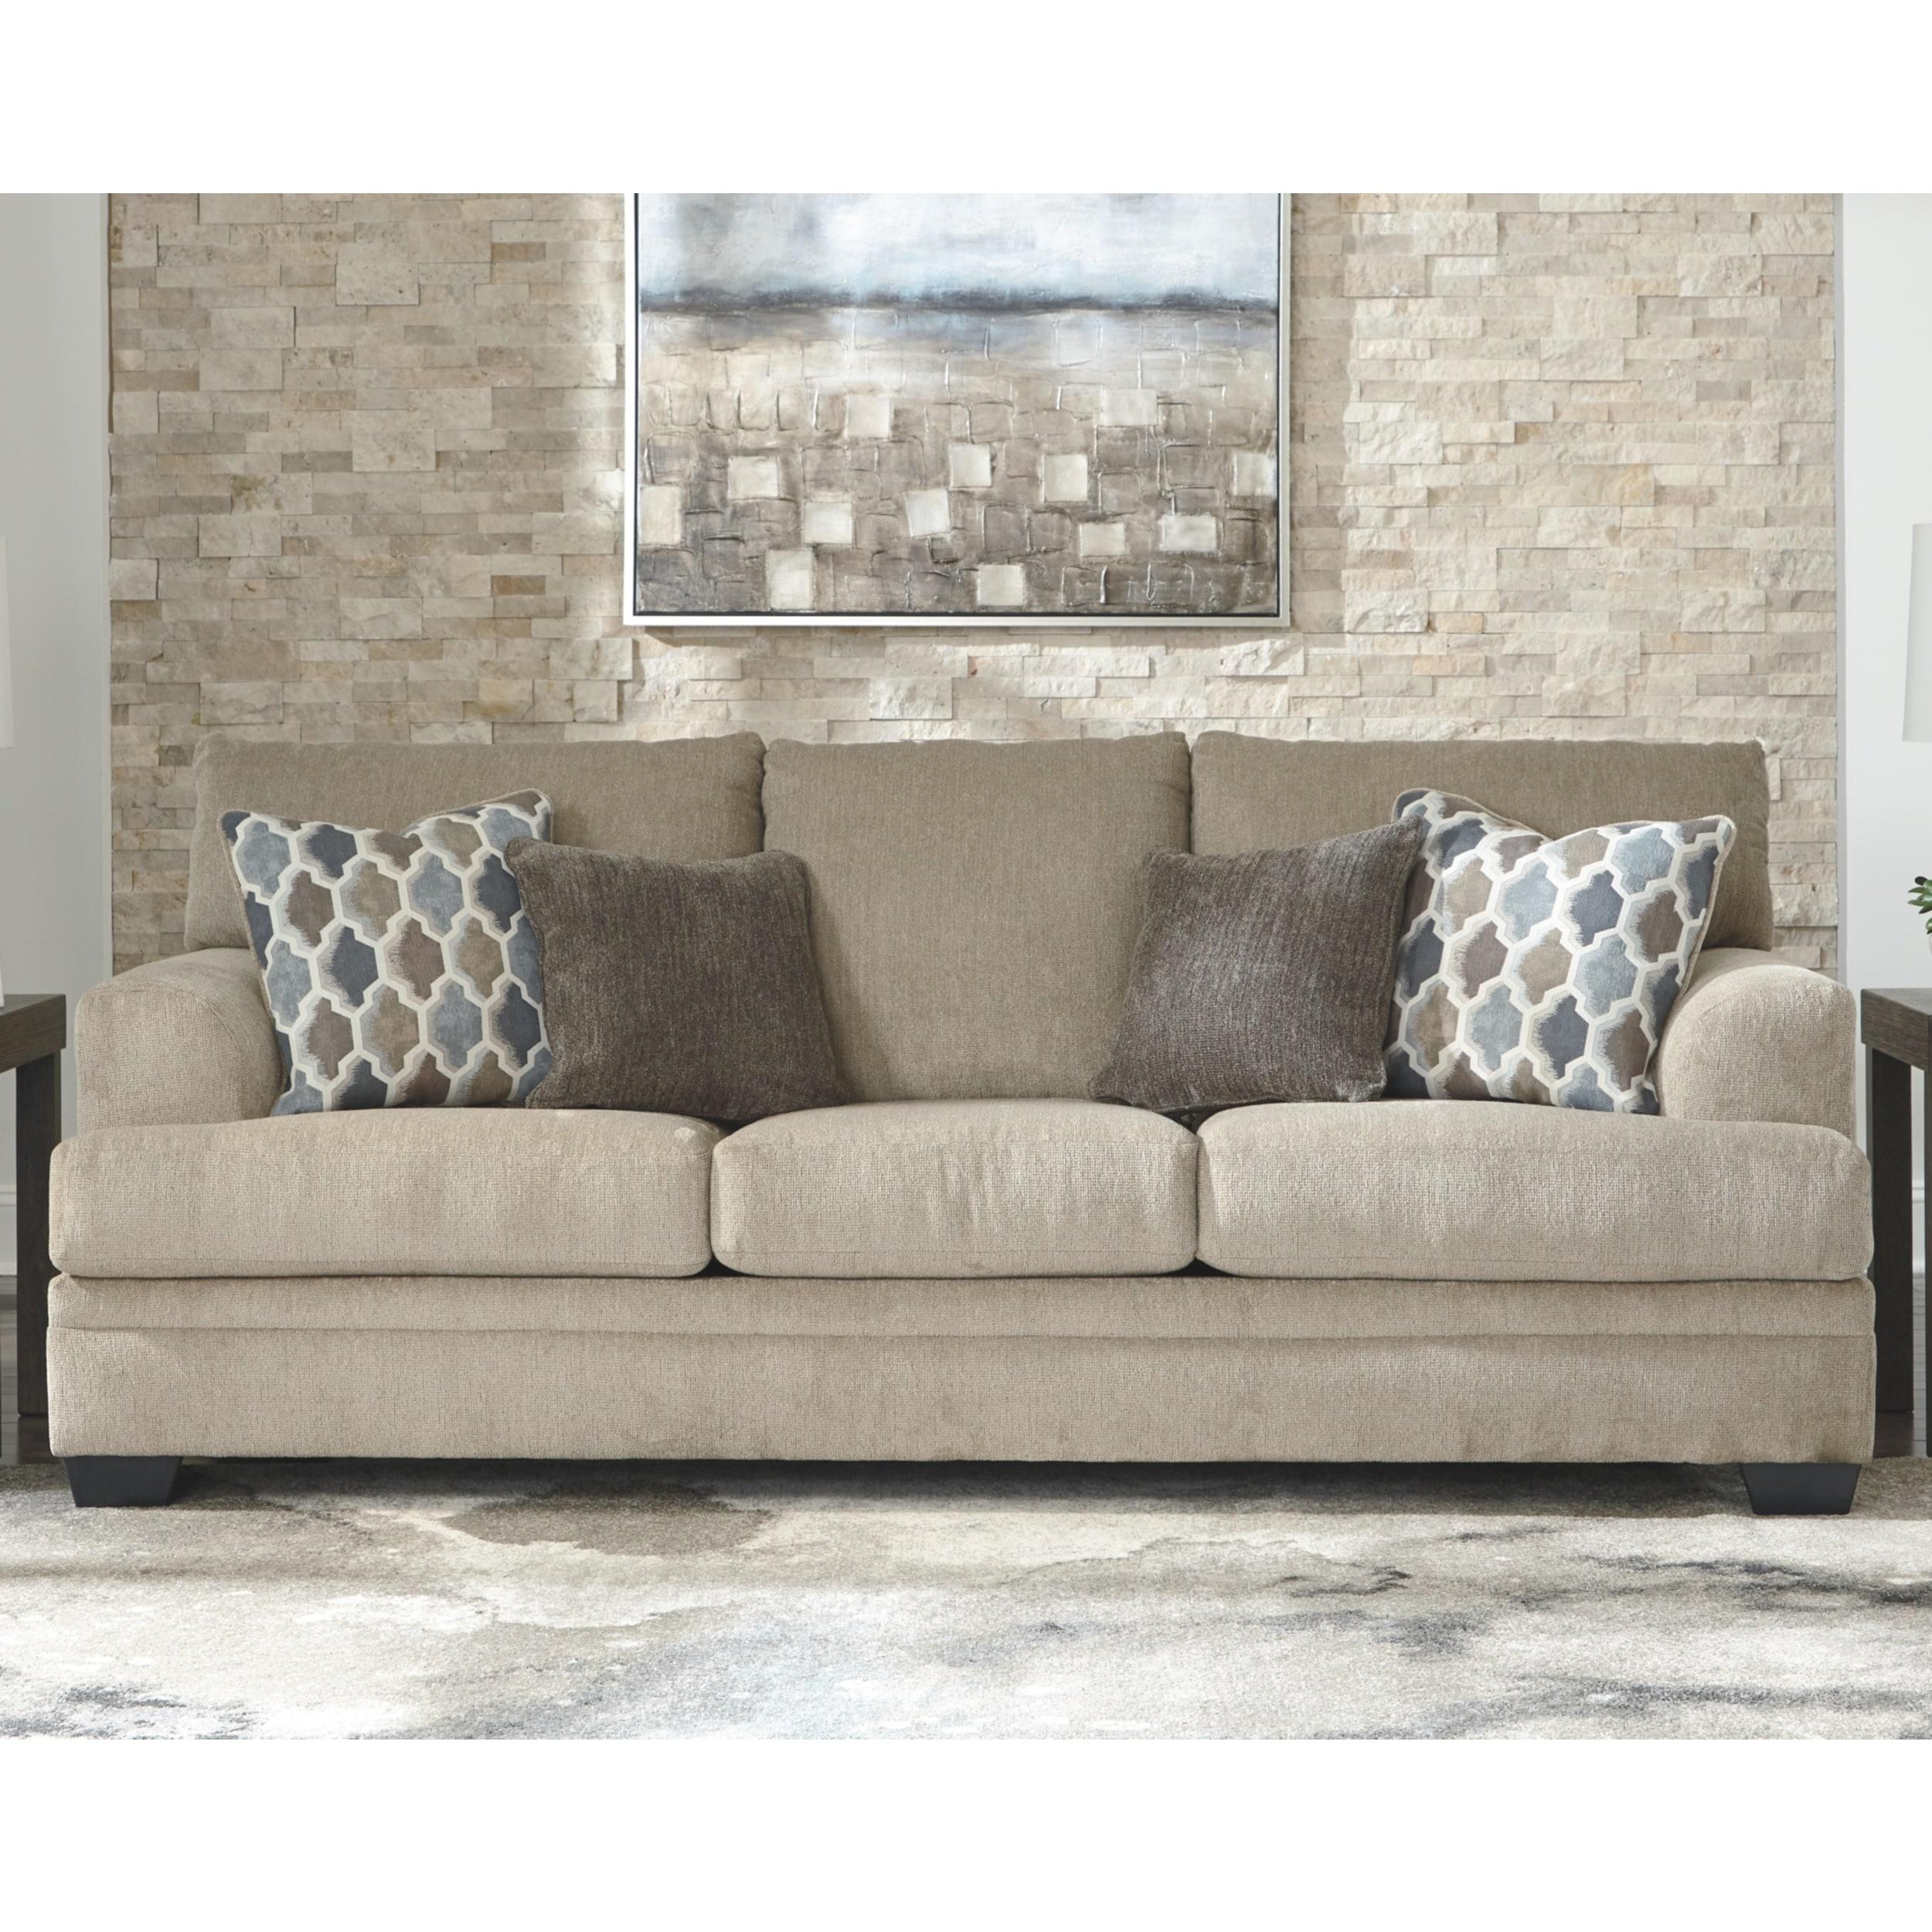 Sisal Sofa With 4 Throw Pillows